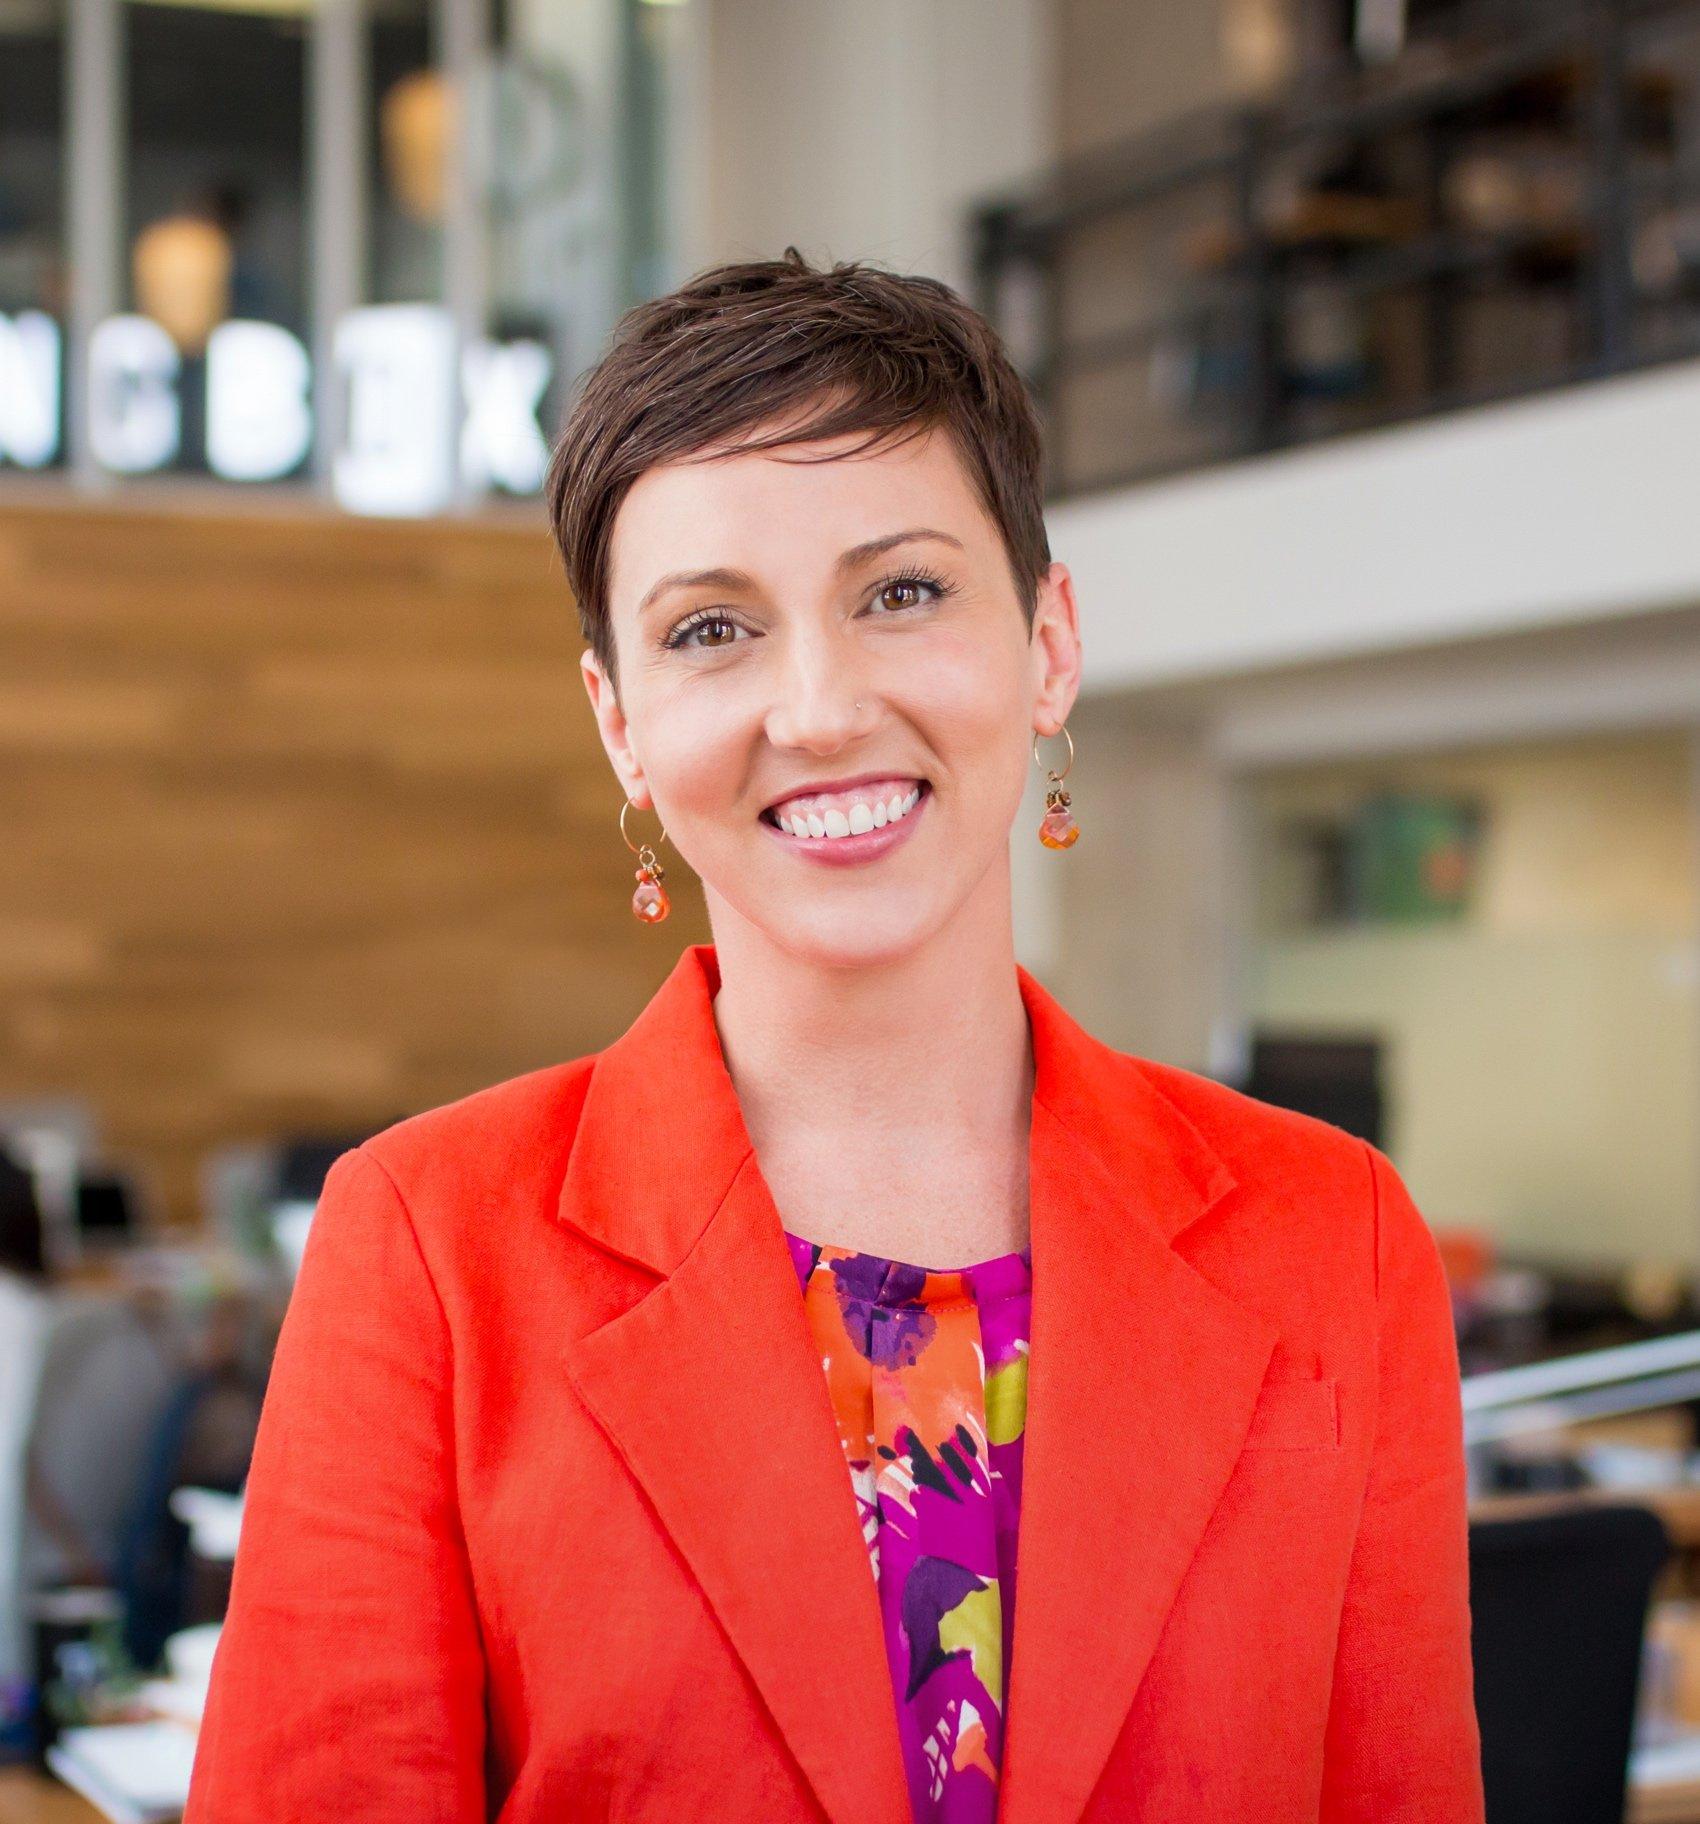 Jenny Magic, Creator at Explain Marketing Consulting and Social Media Approach